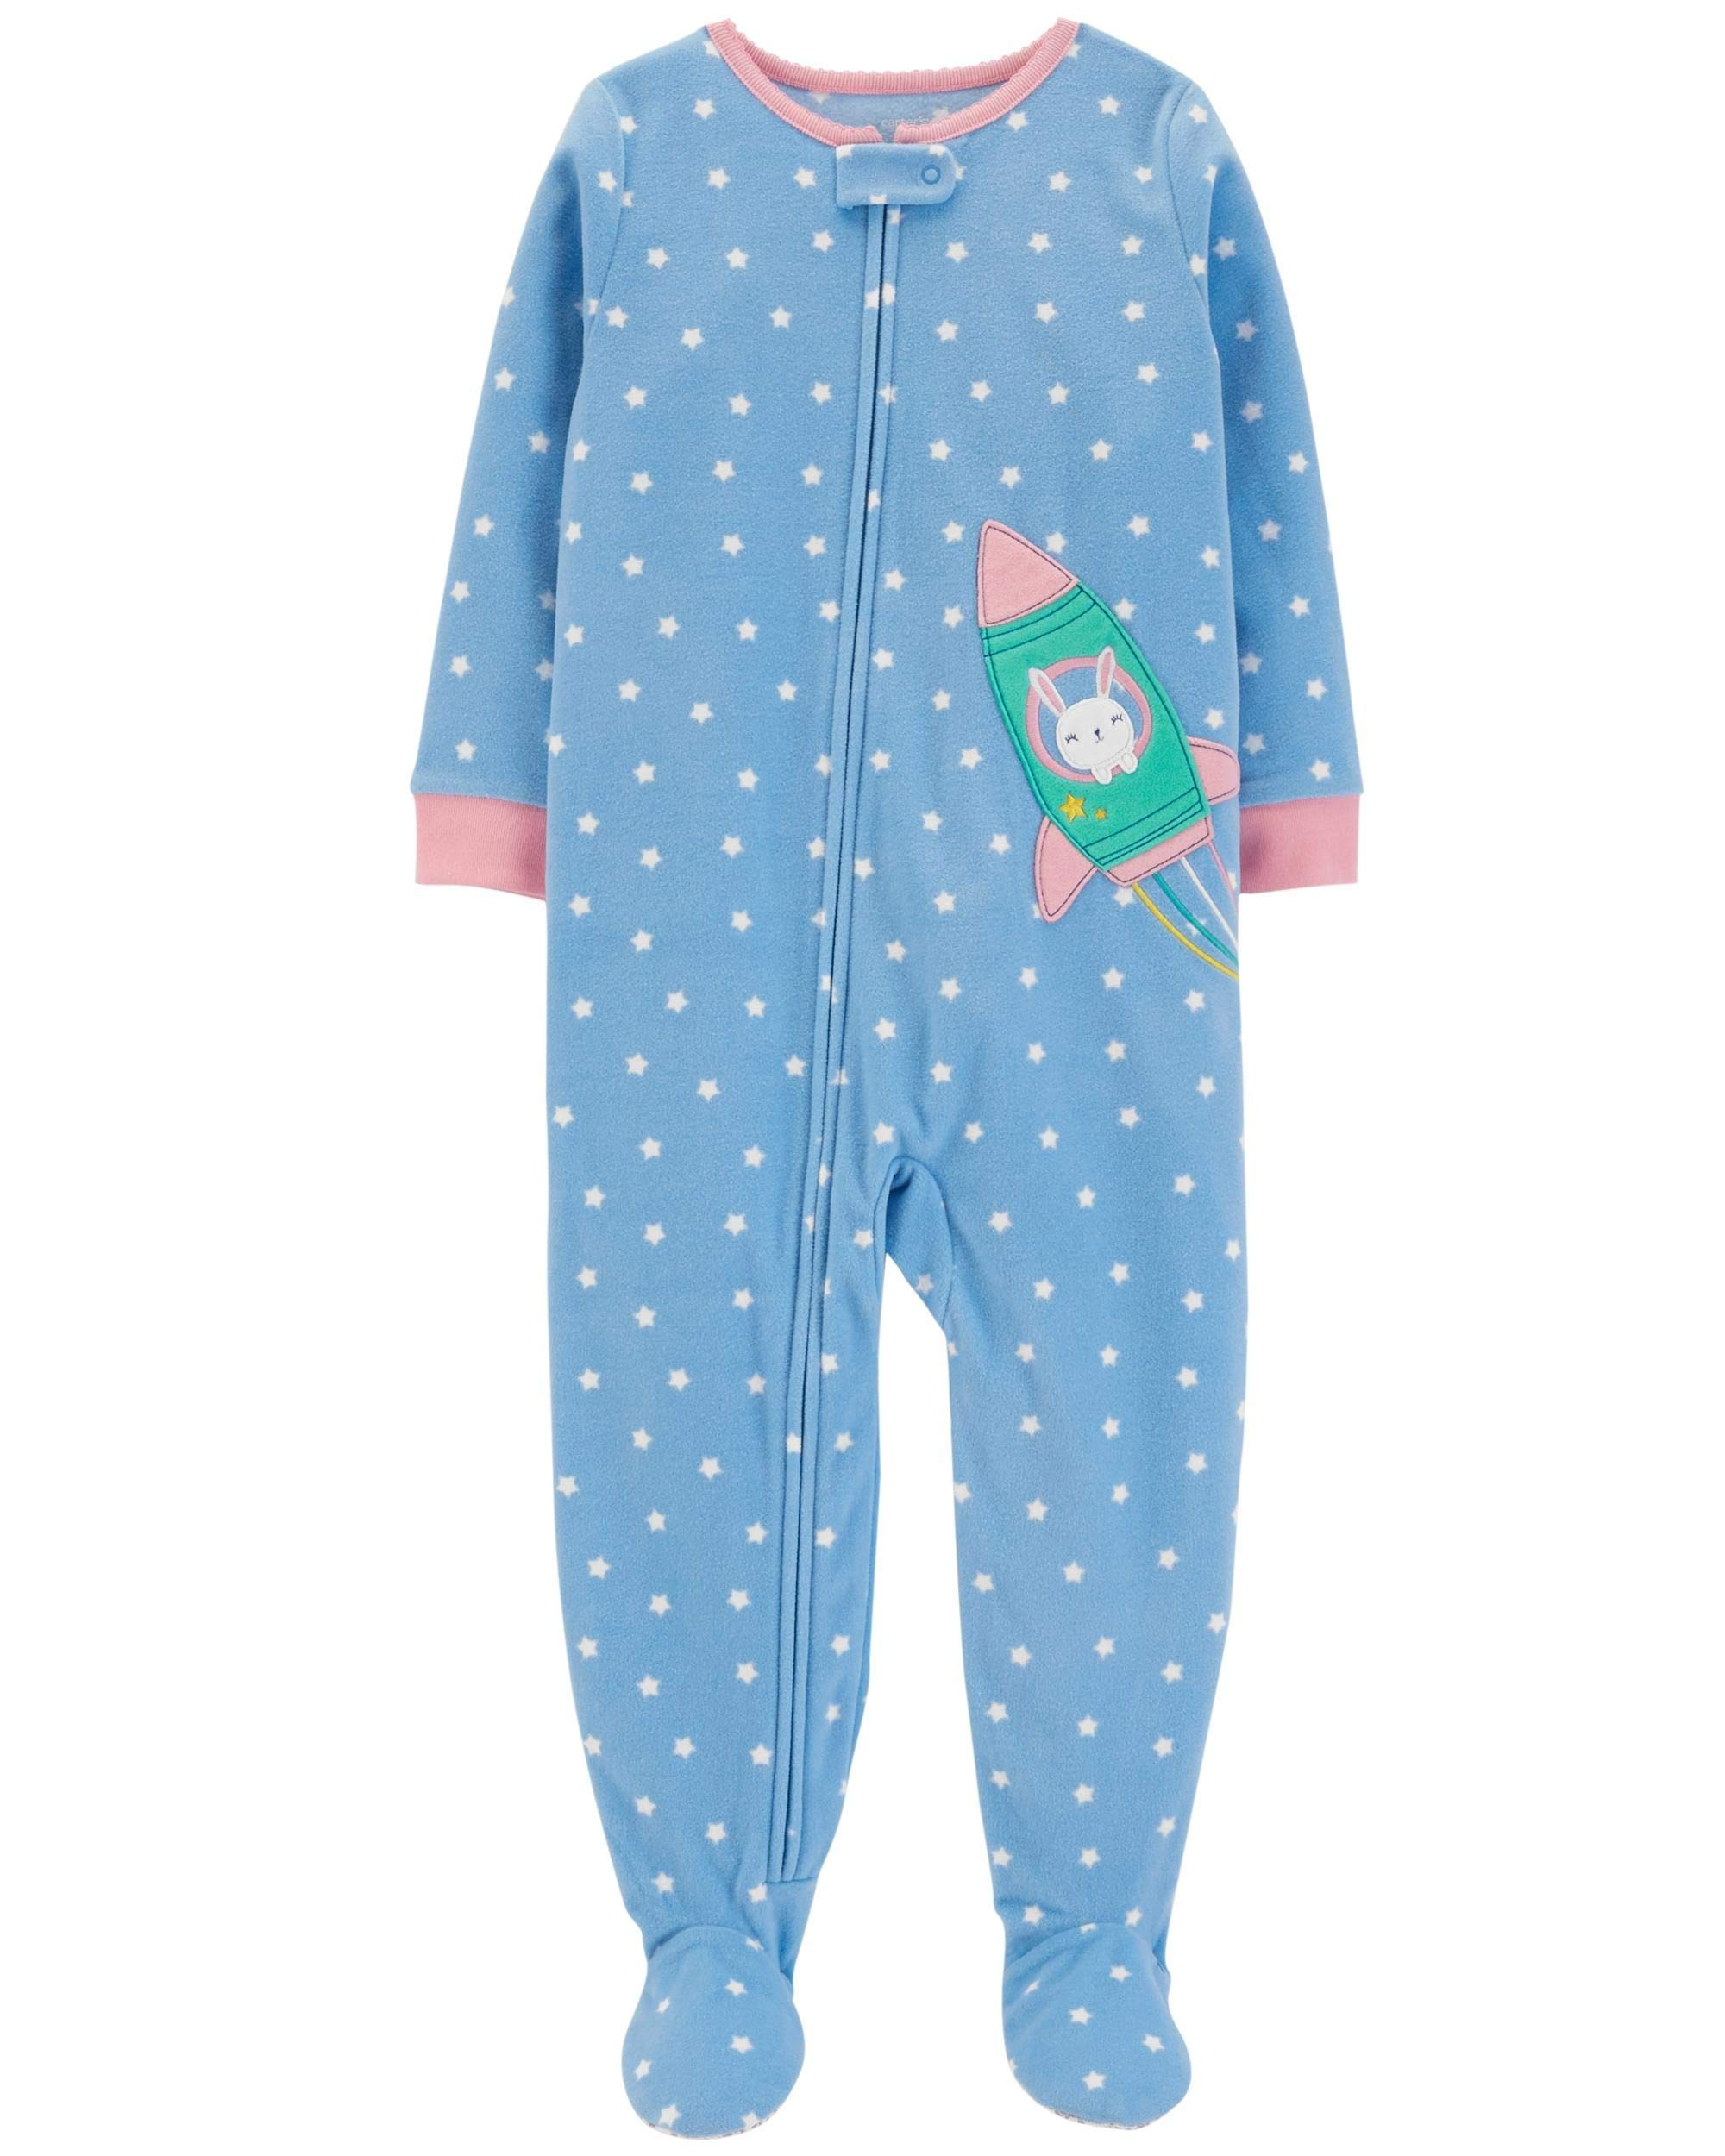 1ad06c685237 Best Rated in Girls  Blanket Sleepers   Helpful Customer Reviews ...